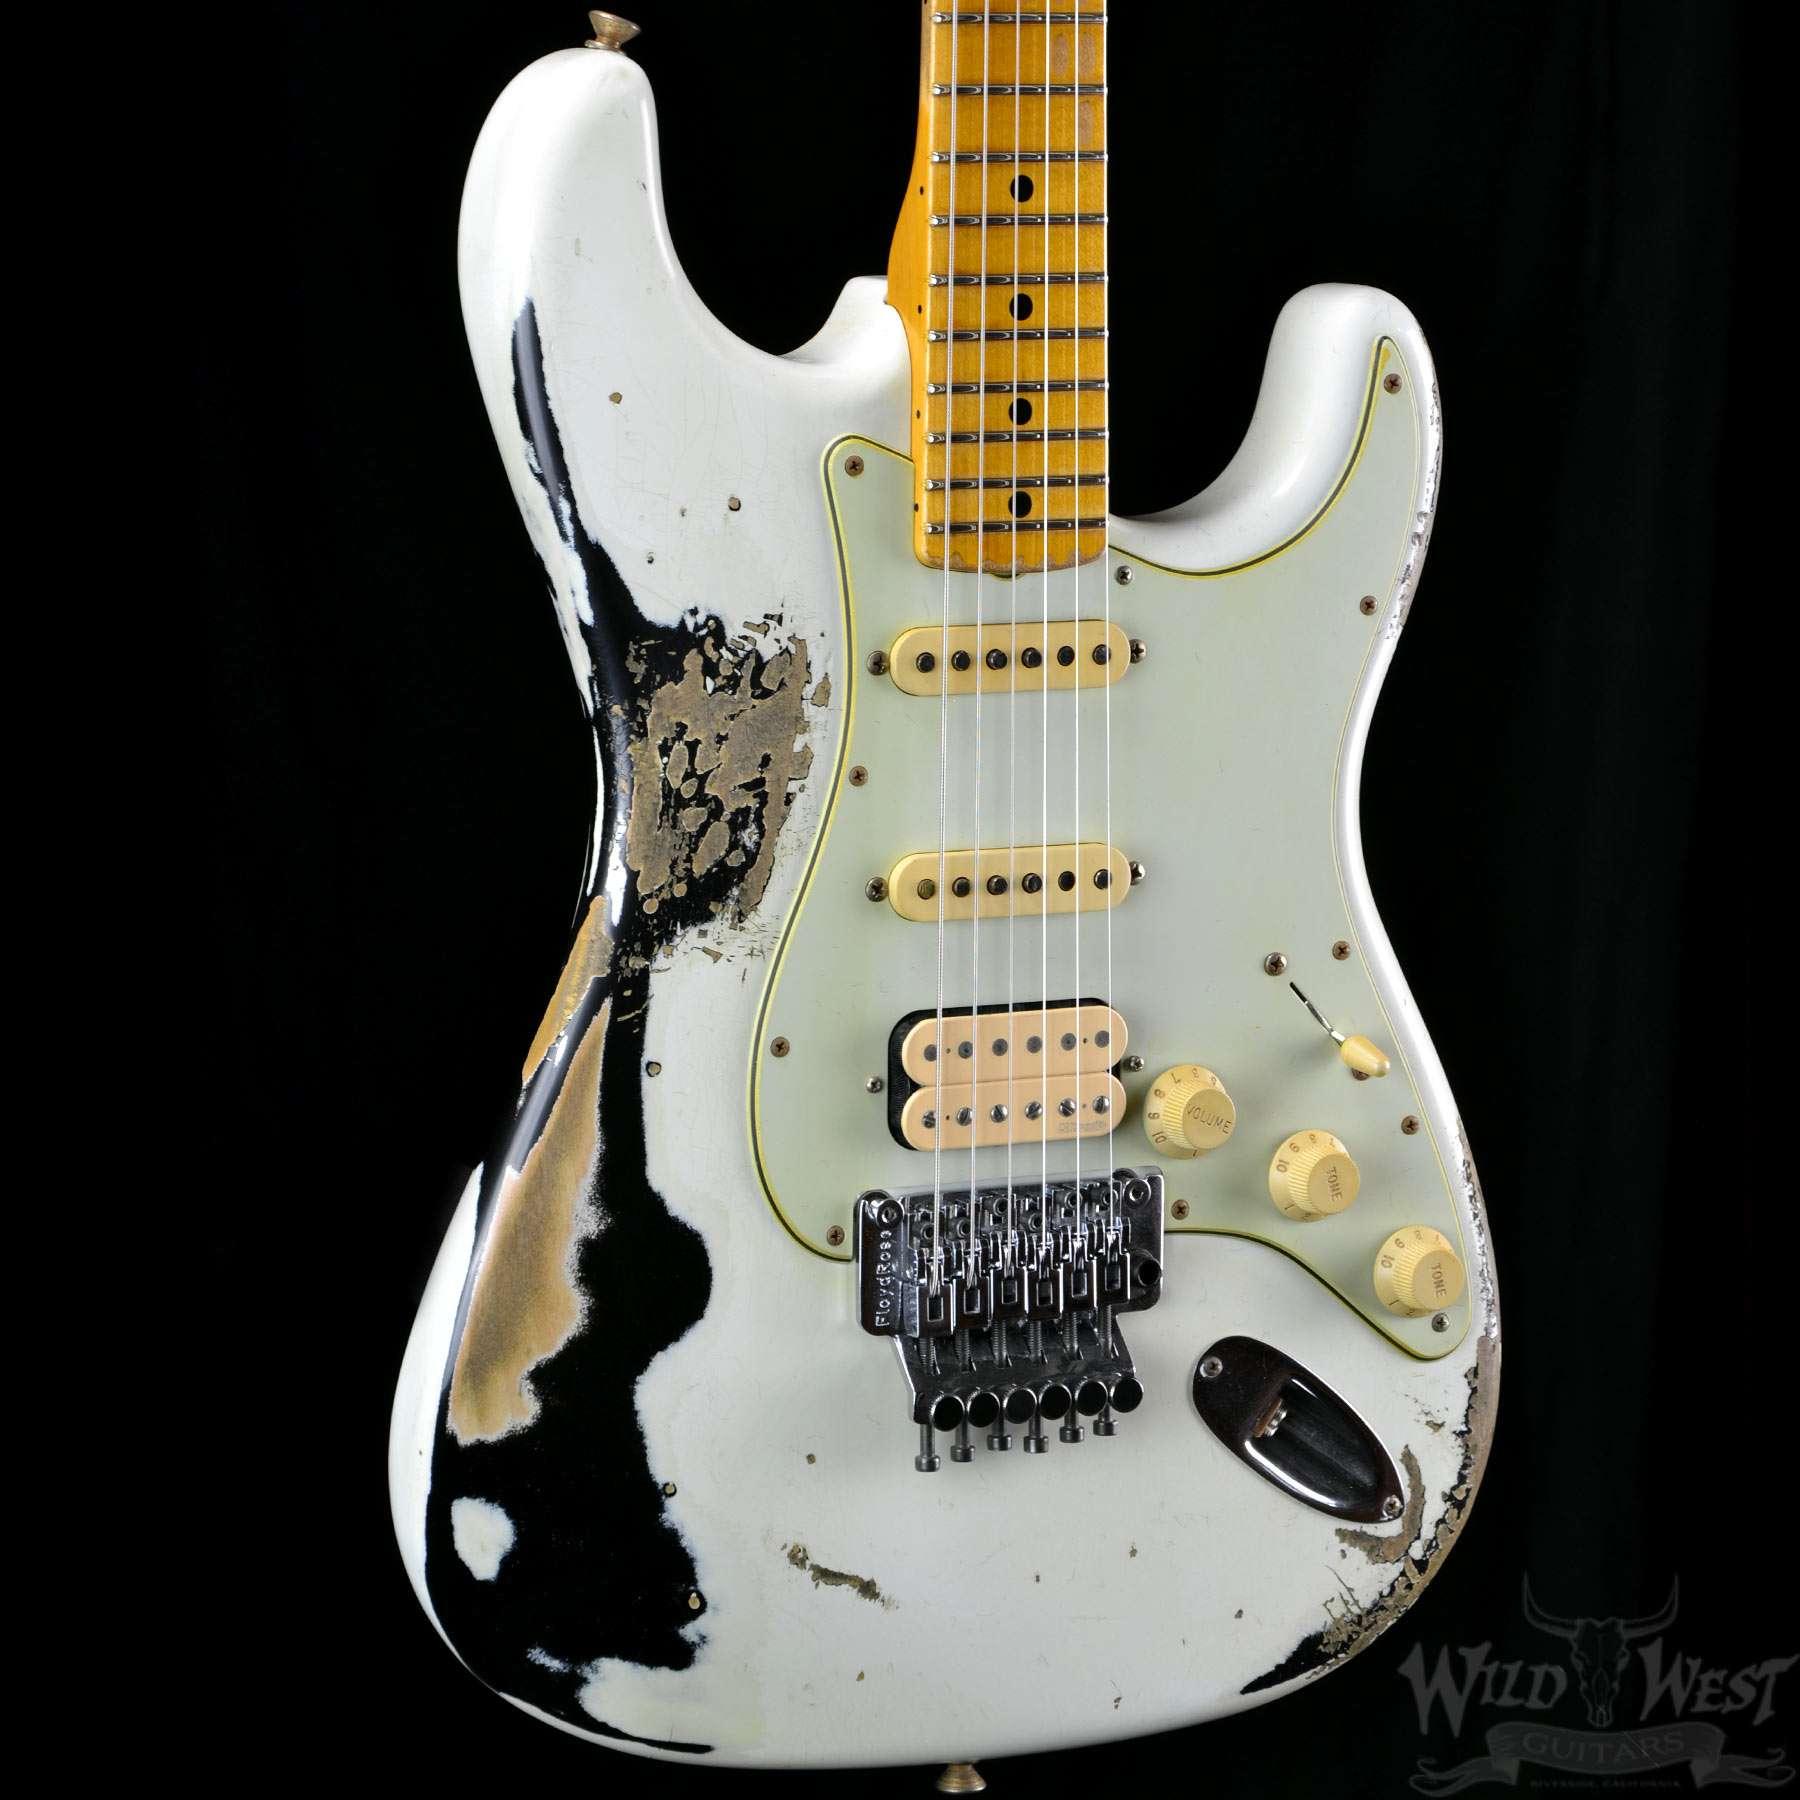 fender 1960 strat heavy relic white lightning olympic white black wild west guitars. Black Bedroom Furniture Sets. Home Design Ideas